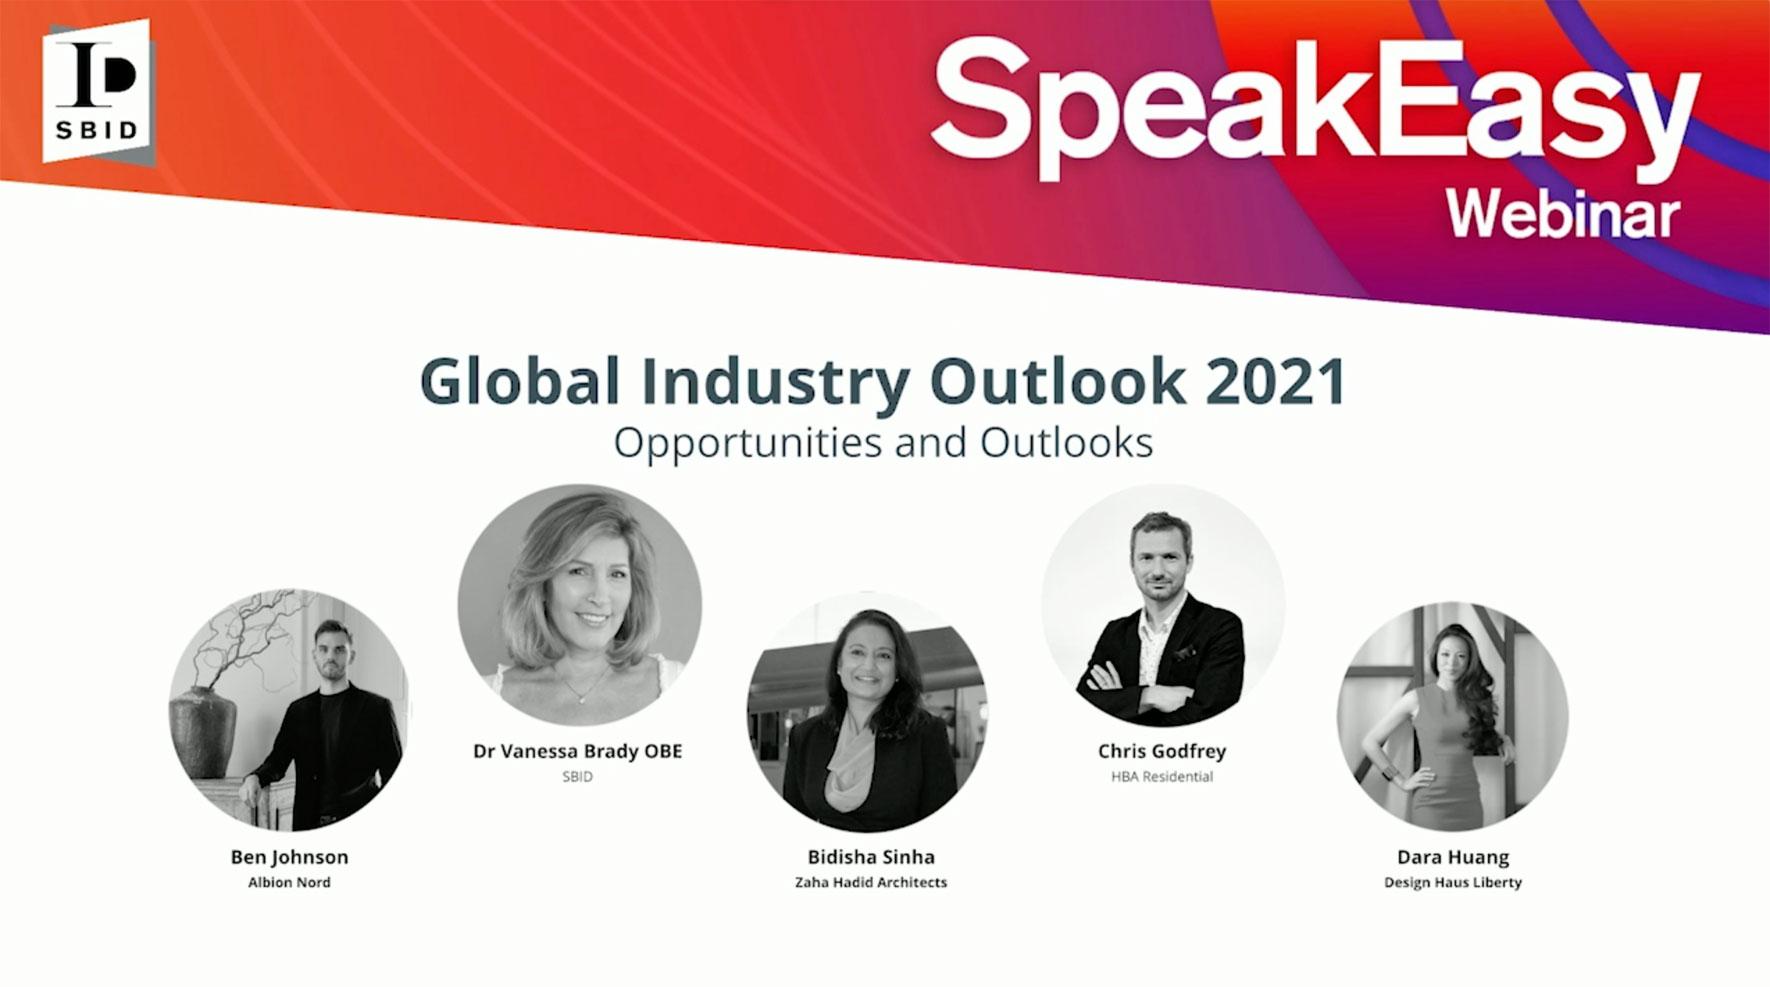 interior design, Interior Design Industry: Future Opportunities & Challenges for 2021